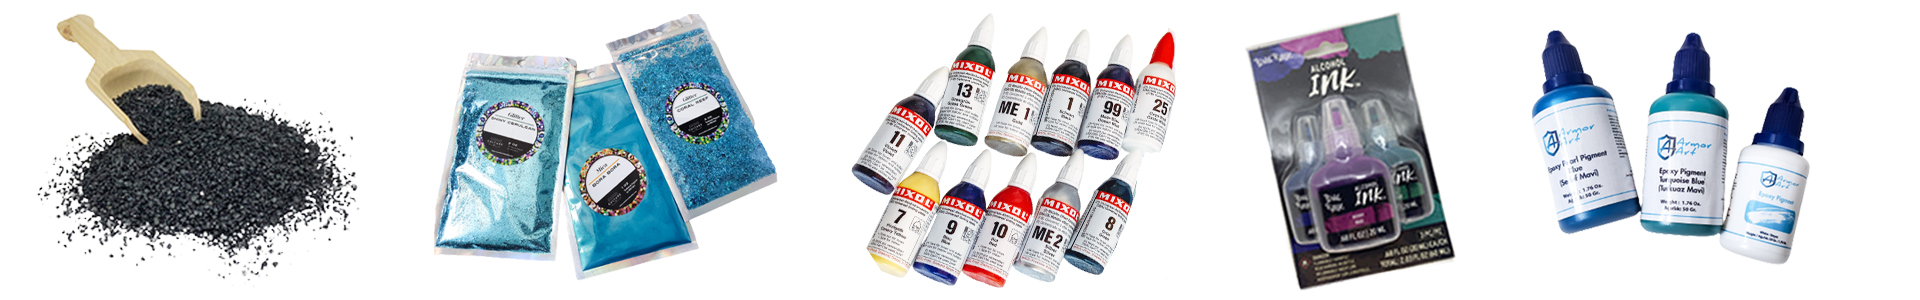 Epoxy Resin Pigment and Glitter